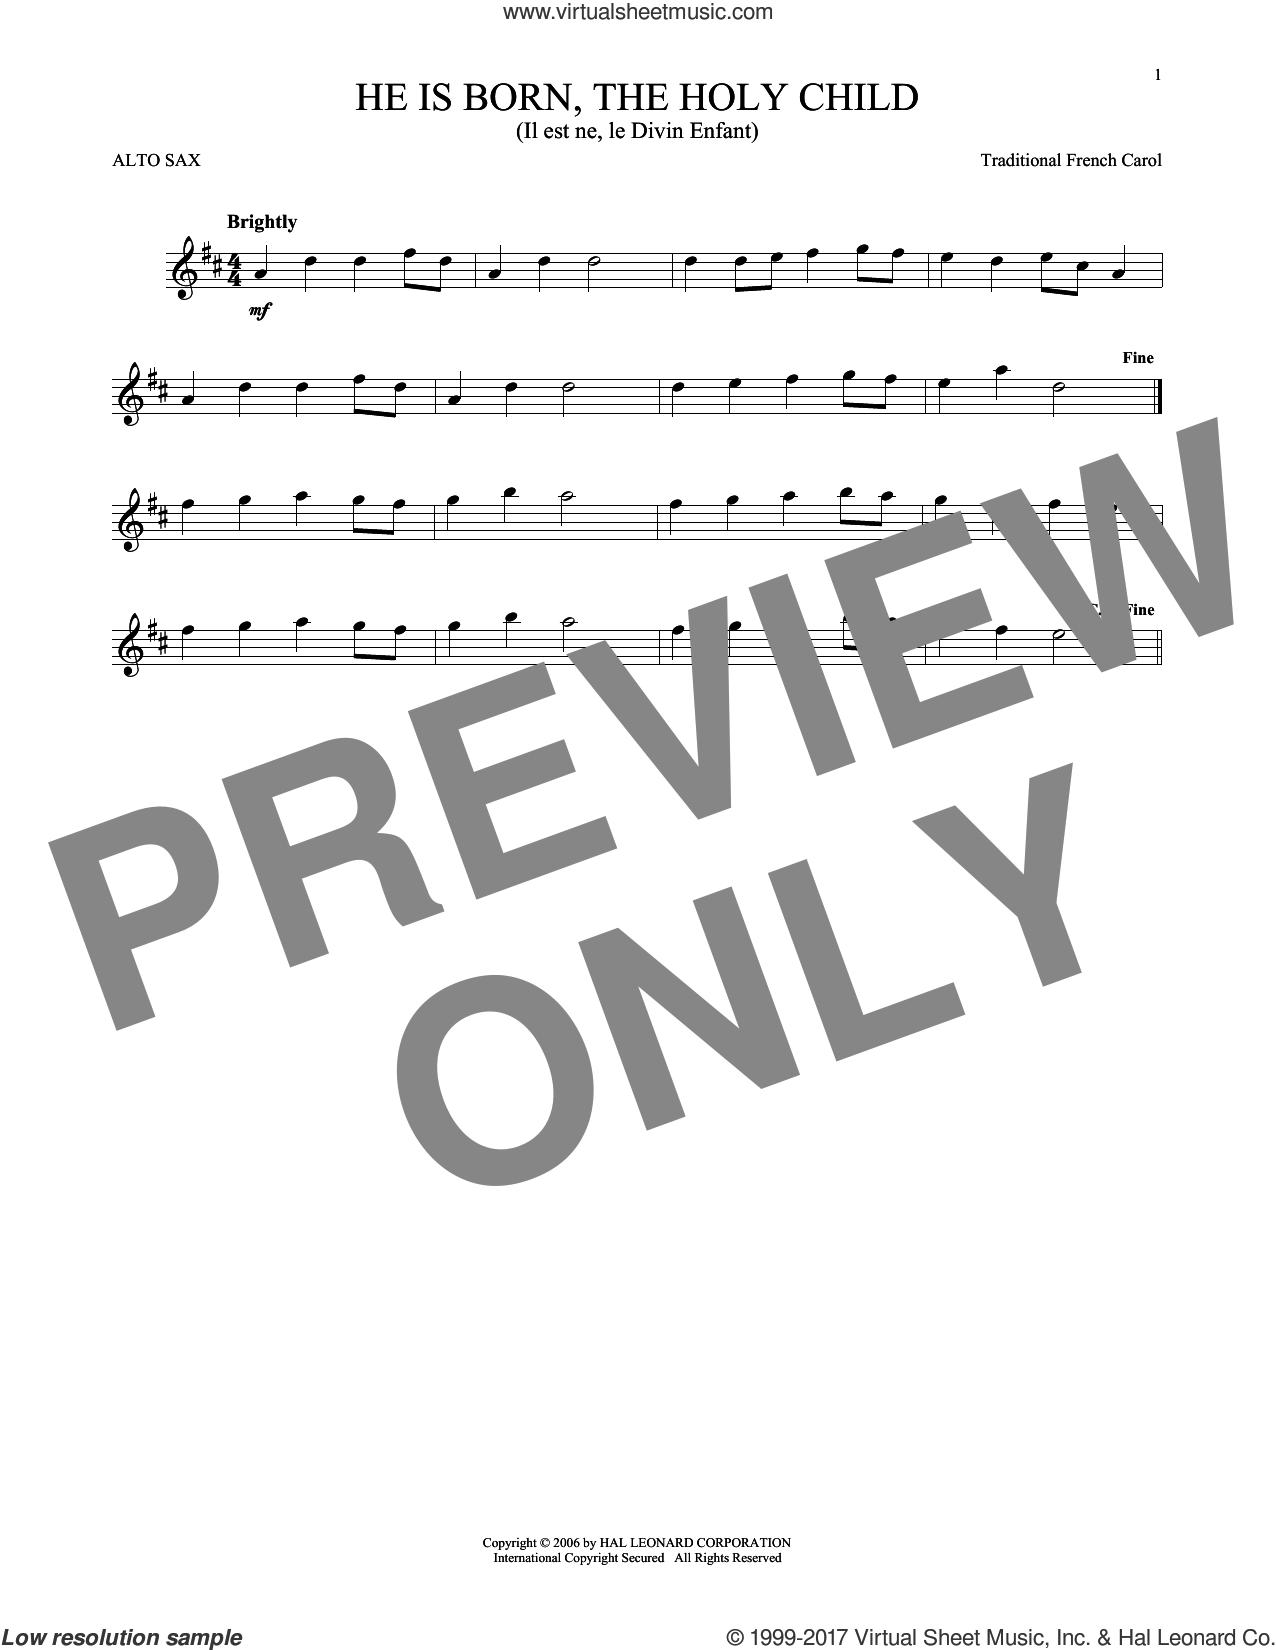 He Is Born, The Holy Child (Il Est Ne, Le Divin Enfant) sheet music for alto saxophone solo, intermediate skill level